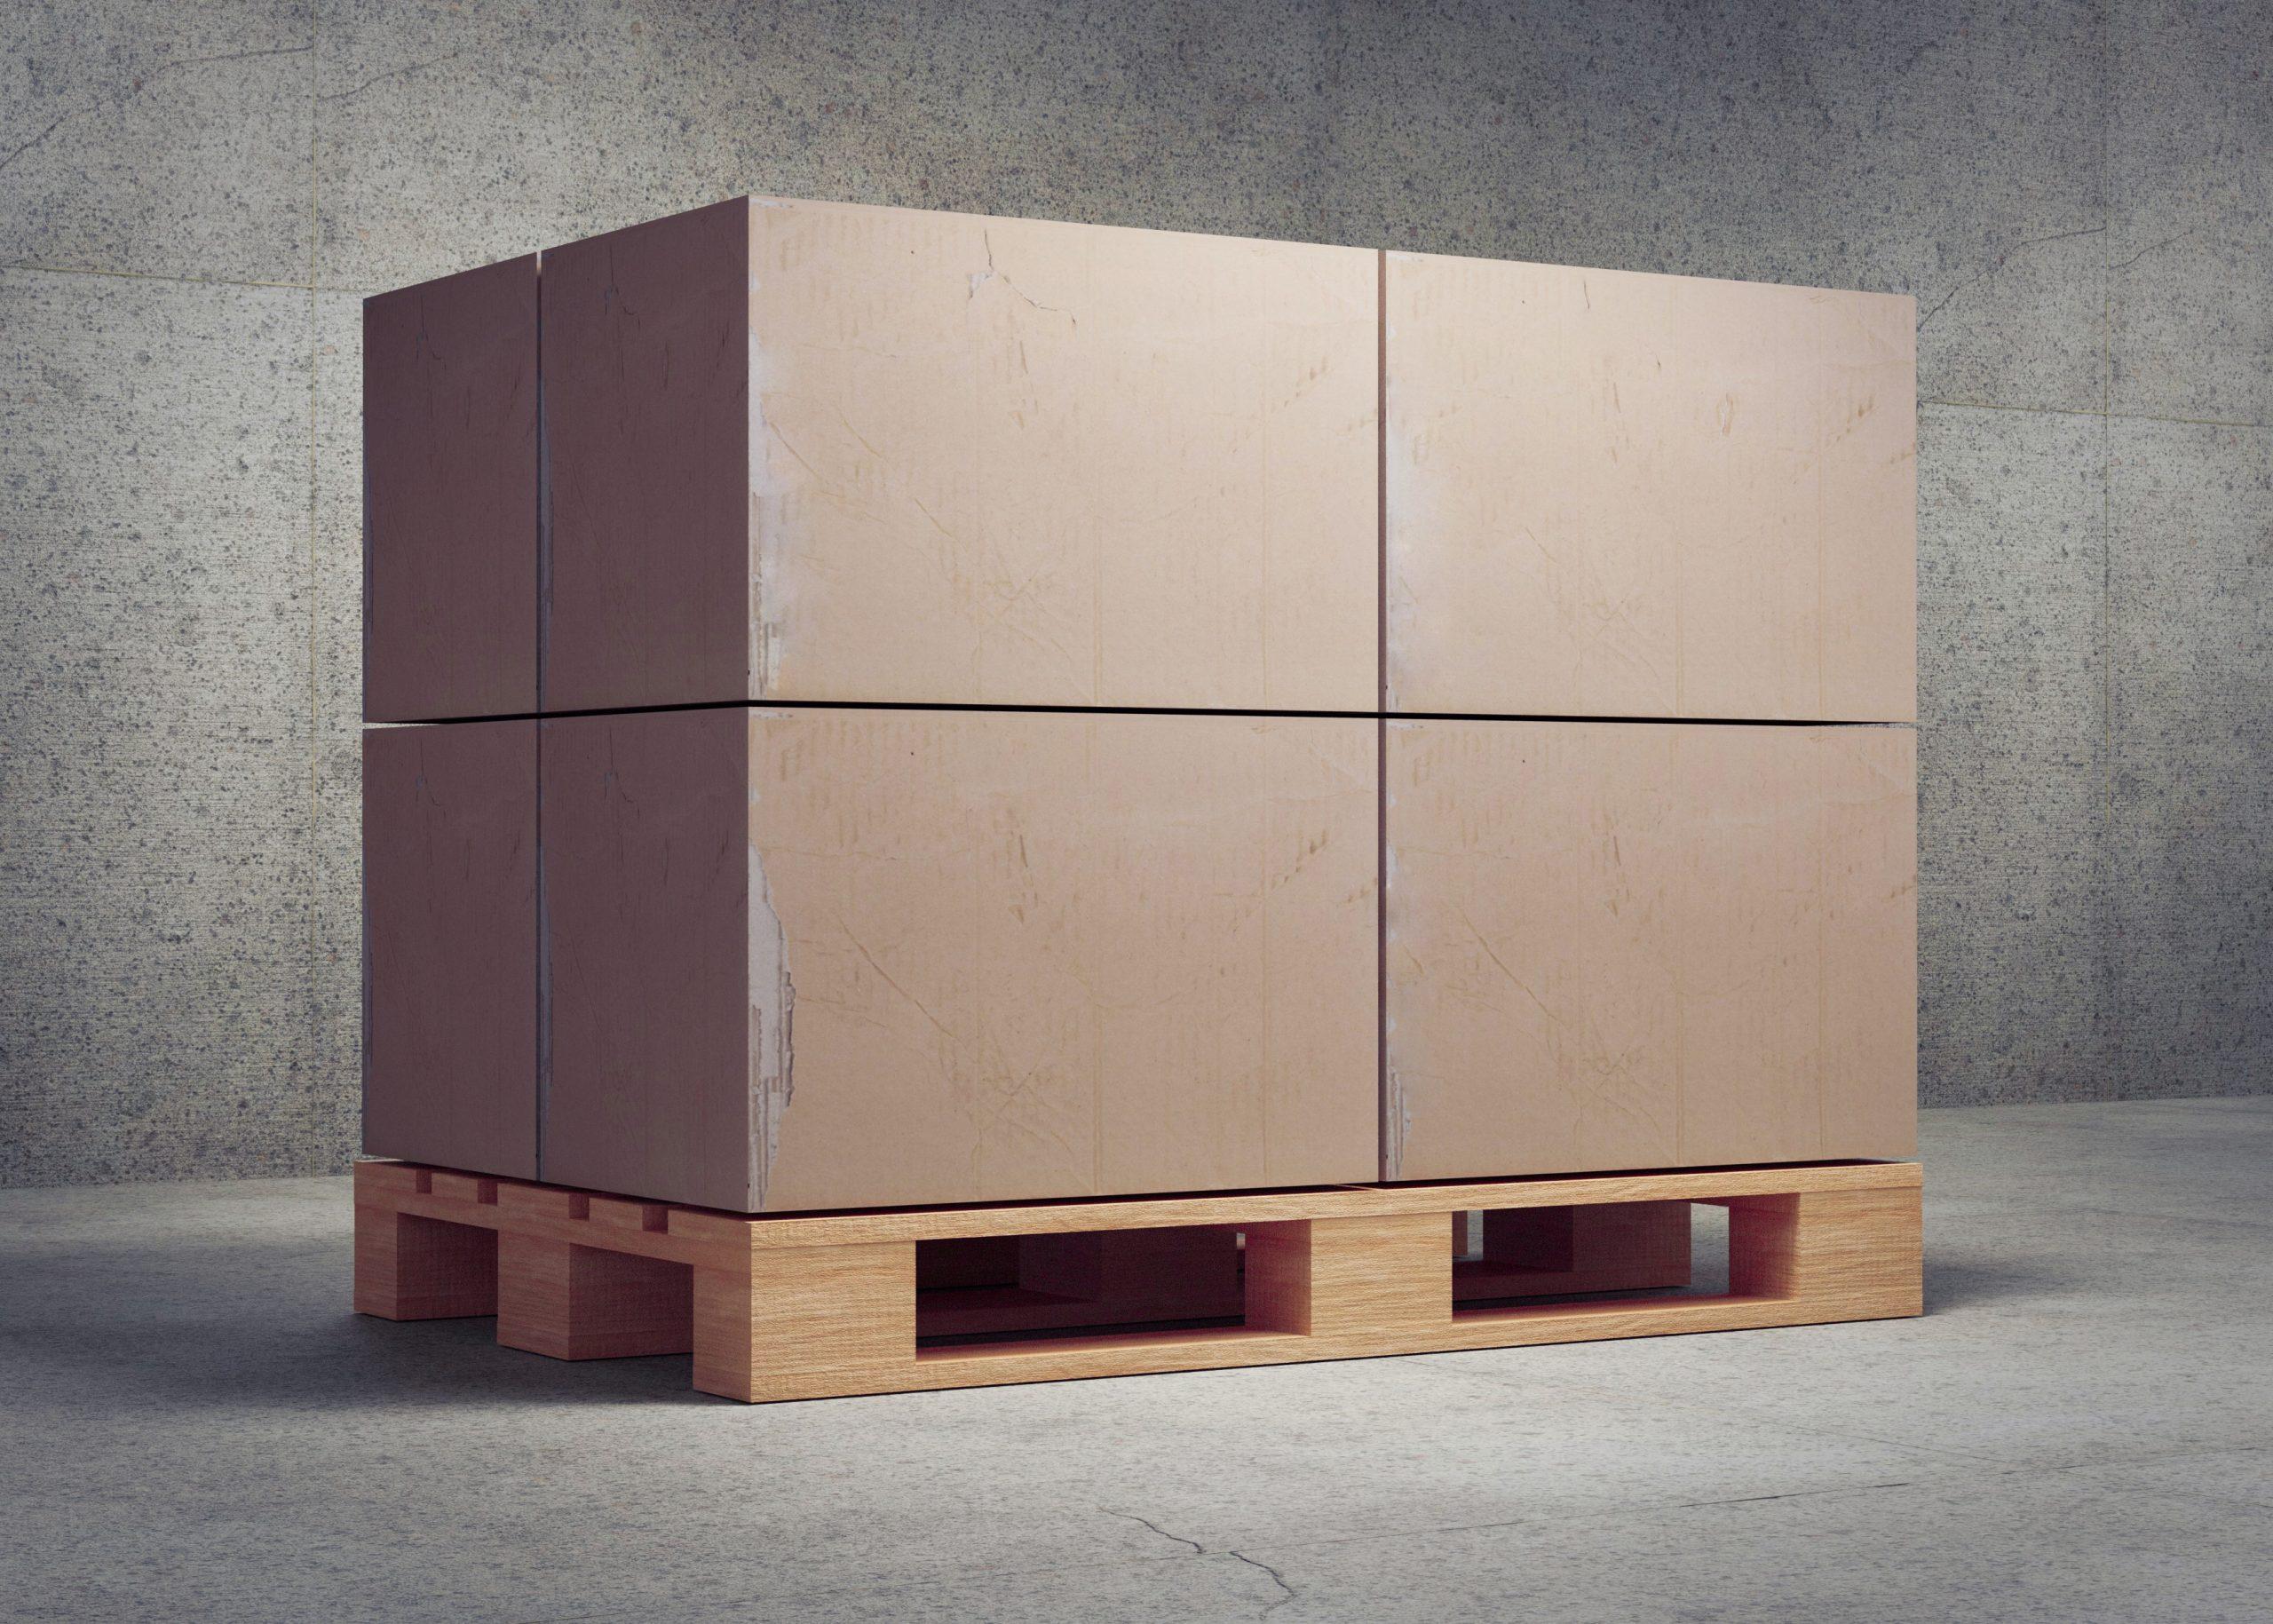 Pallettes with boxes. 3d render